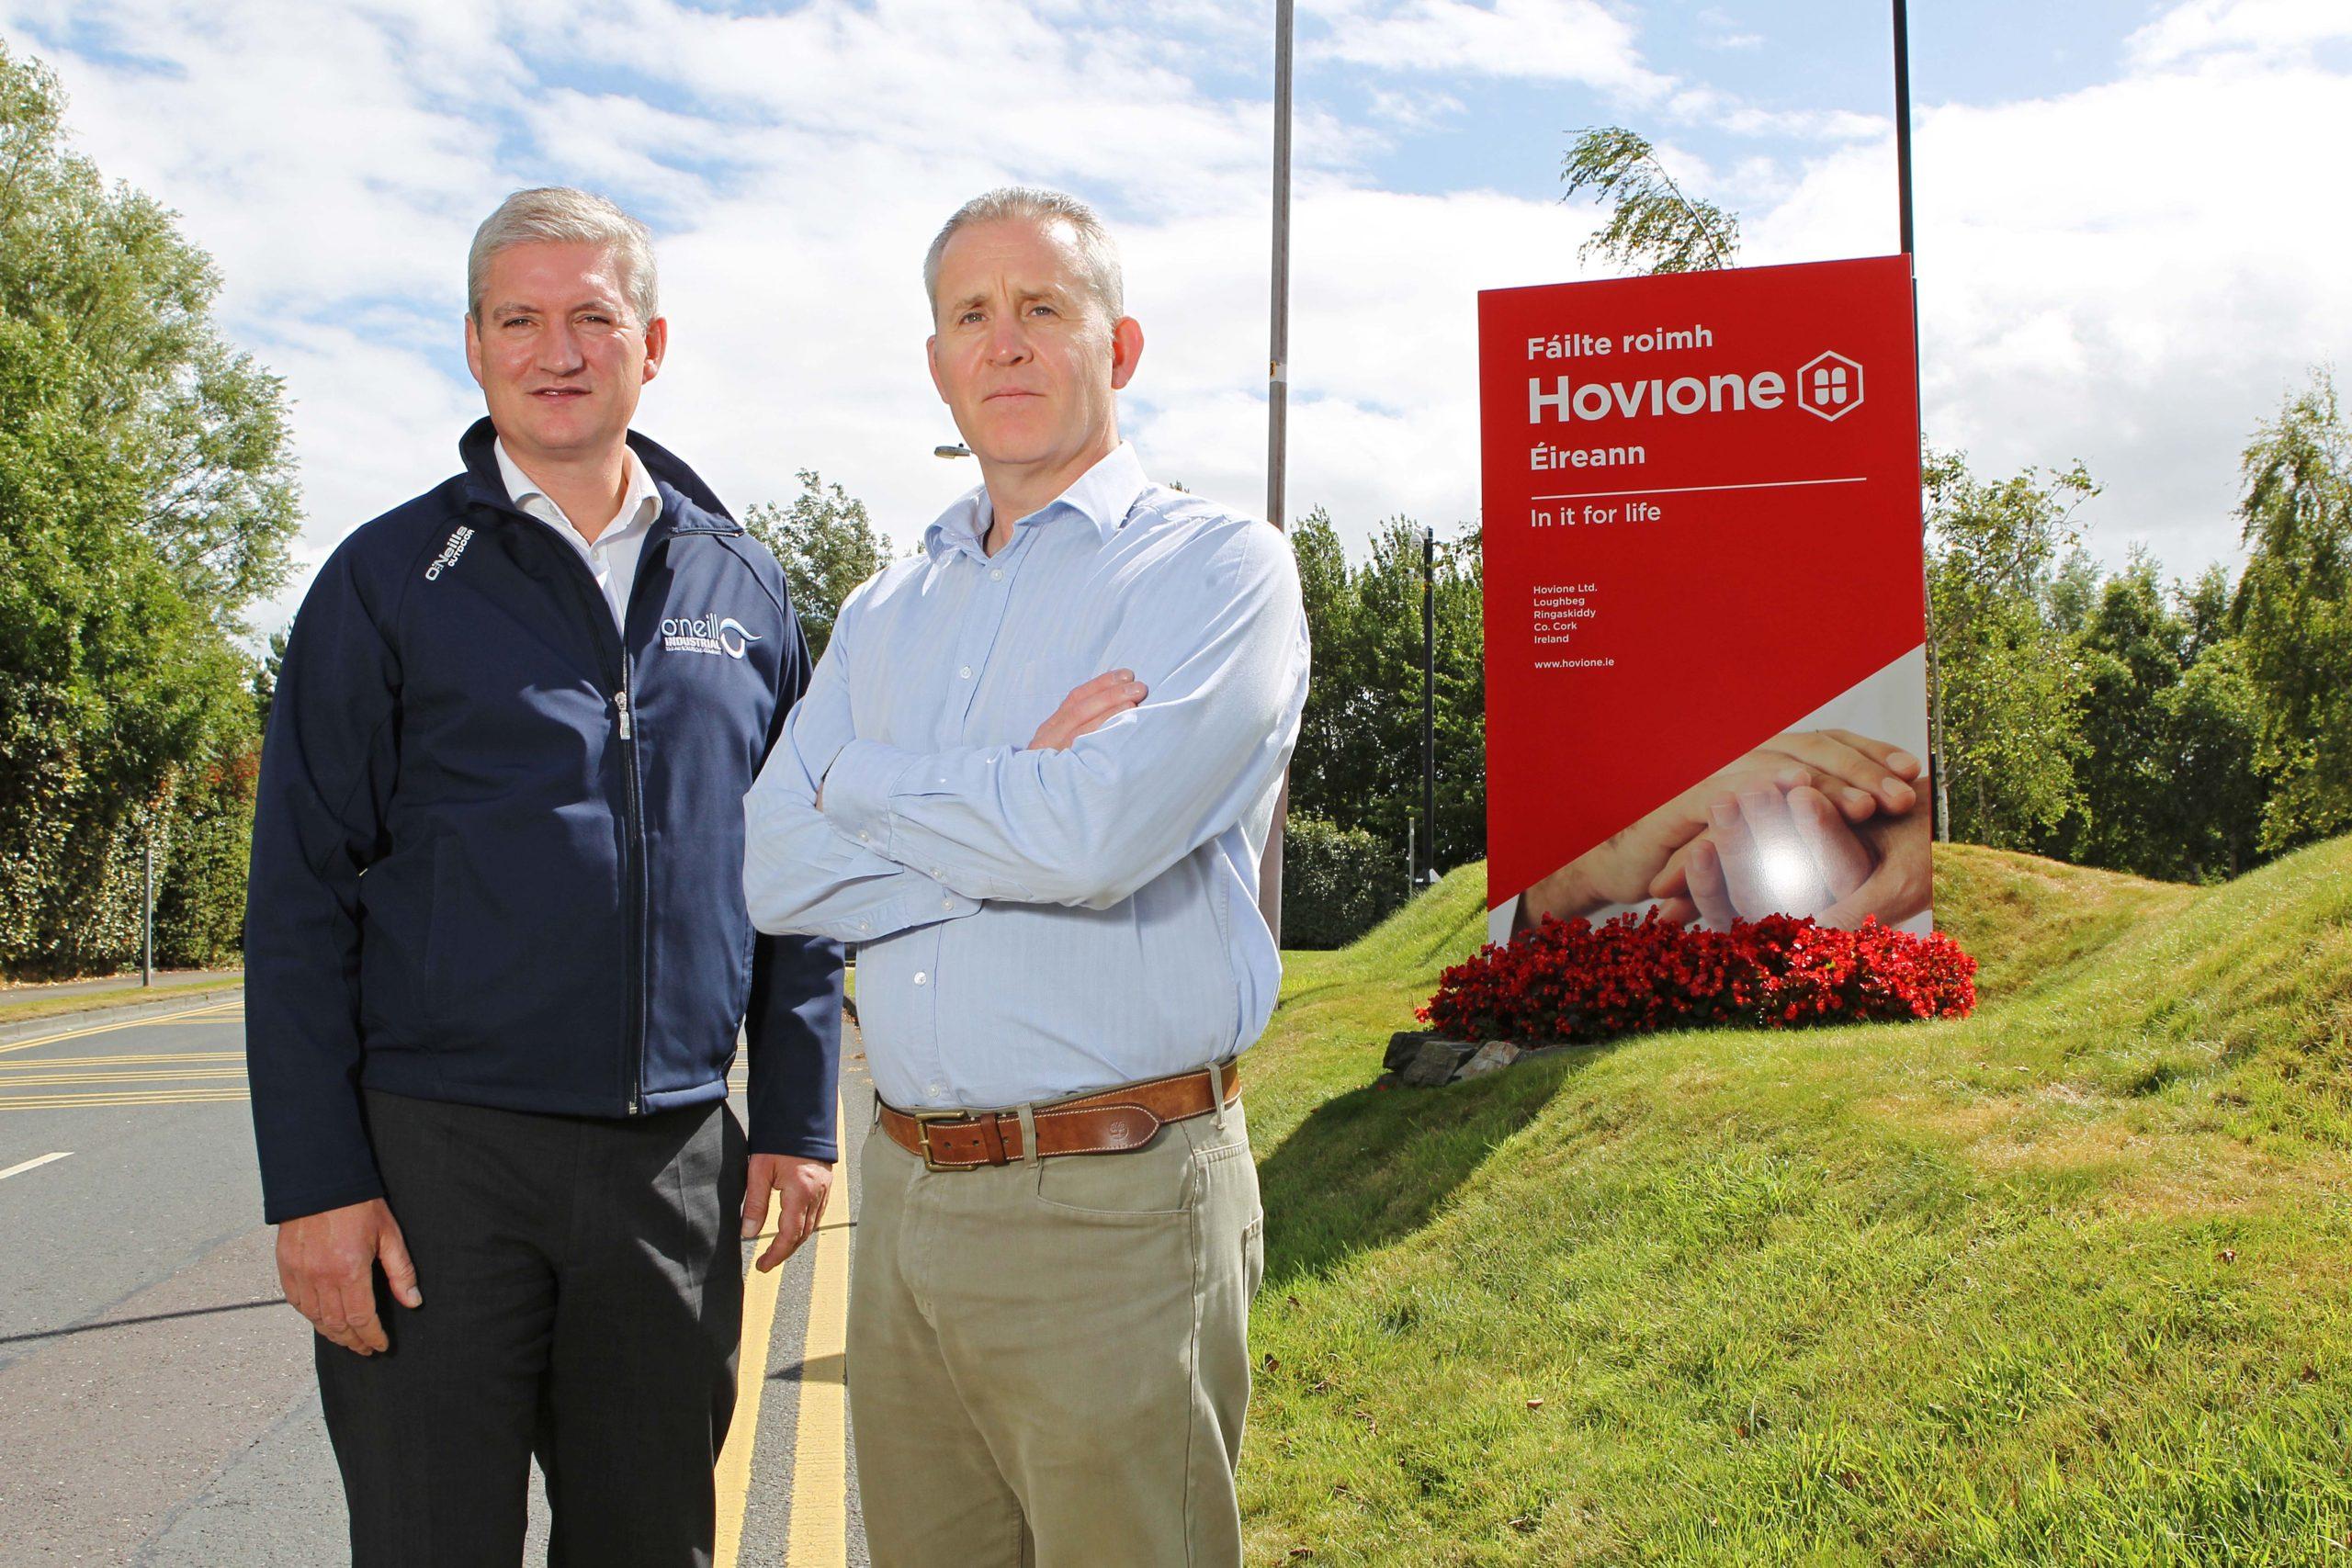 O'Neill Industrial & Hovione